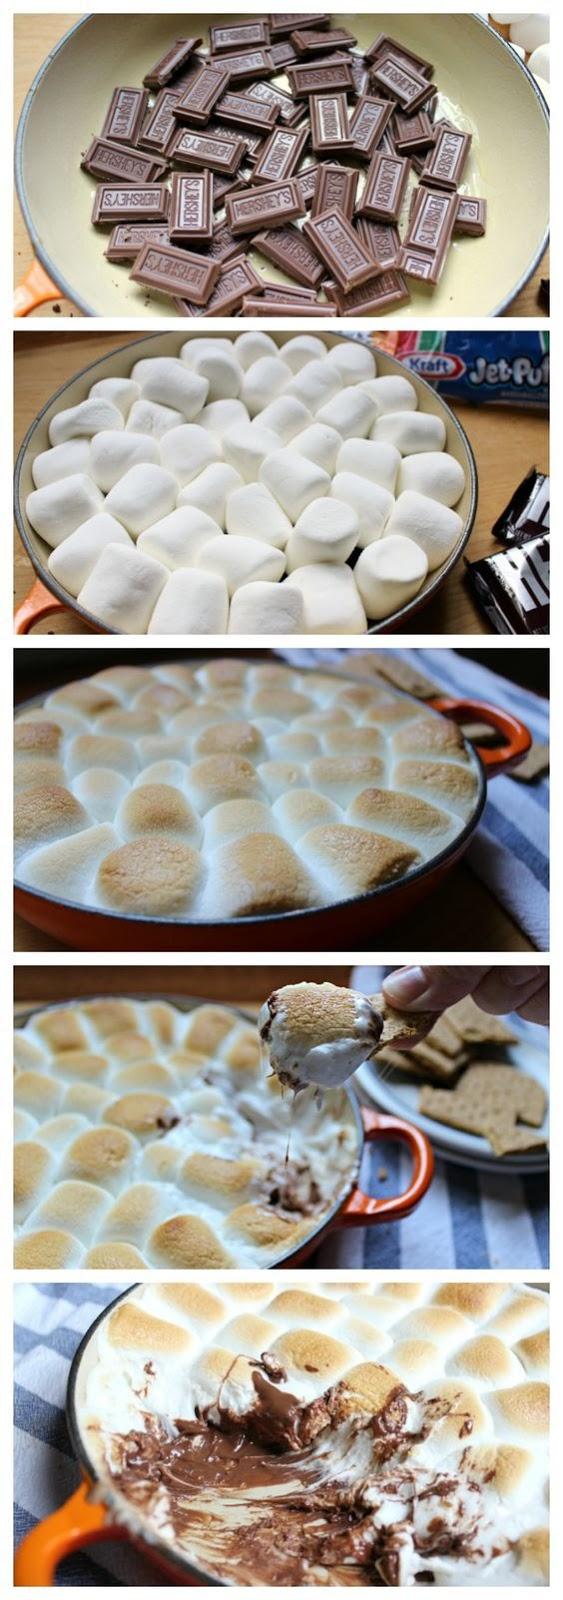 Smores Dip Recipe #smores #dip #smoresrecipes #smoresdiprecipes #easyrecipes #marsmallow #chocolate